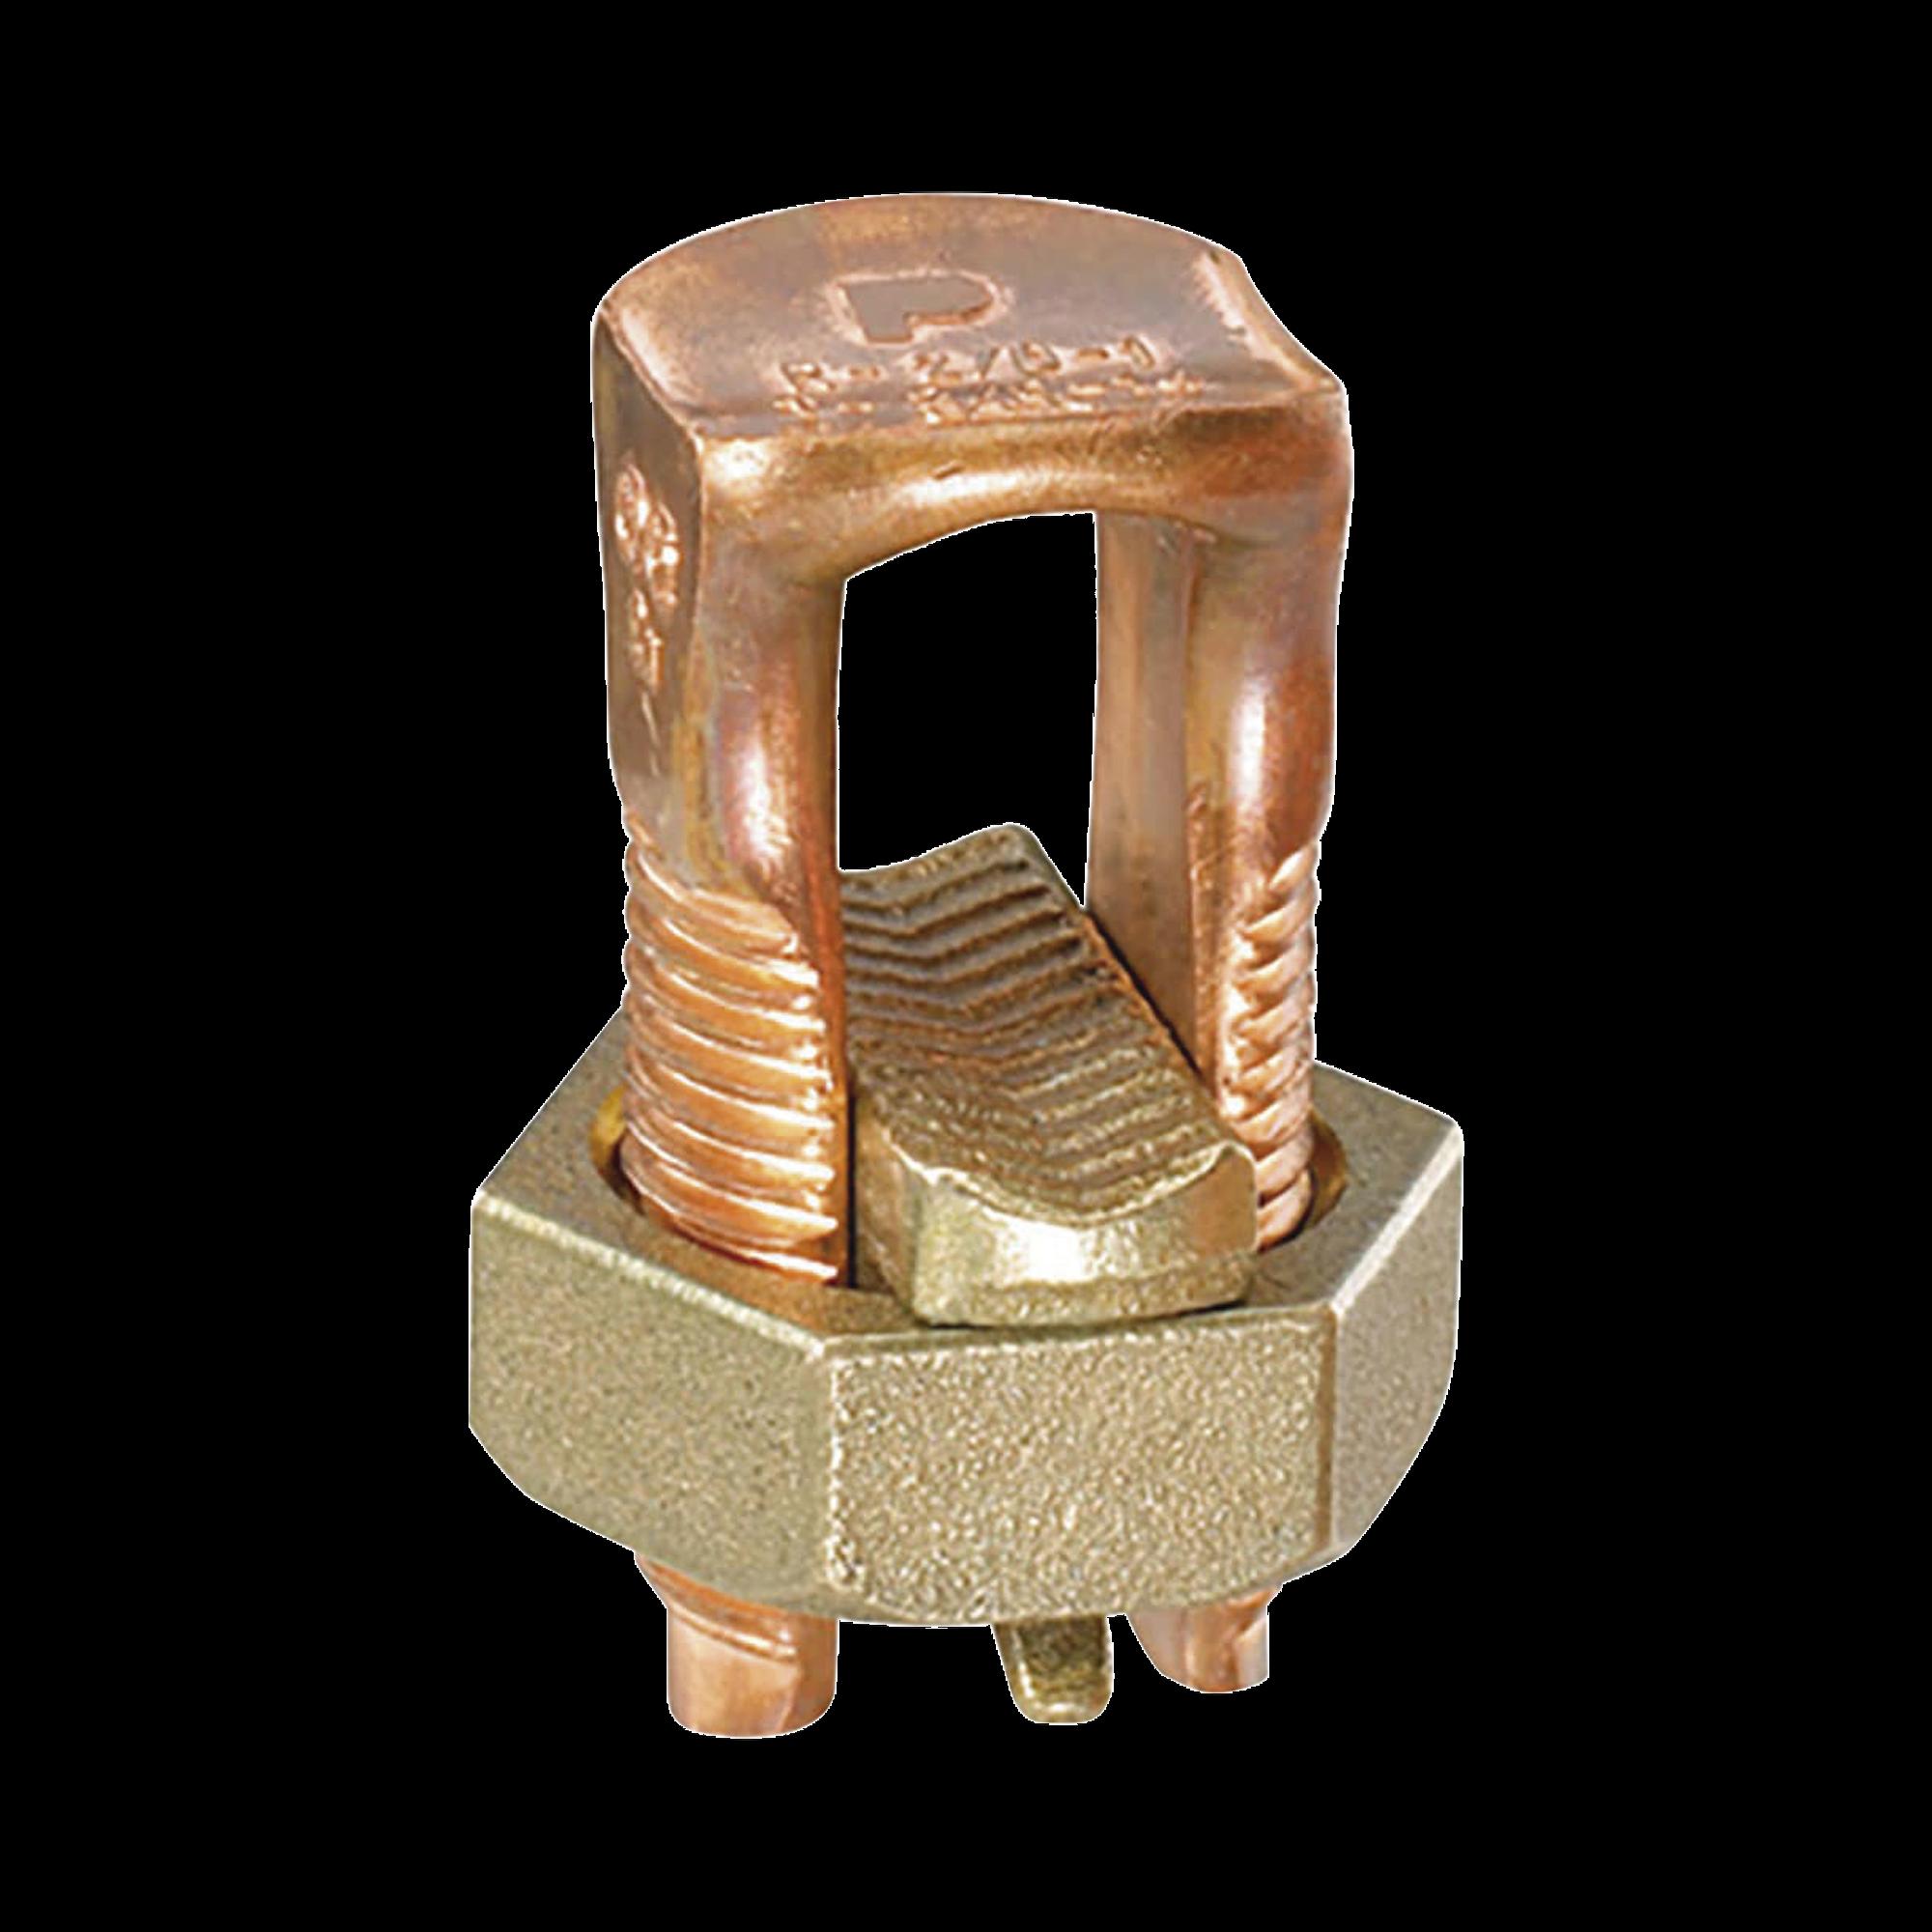 Conector Mecánico de Puesta a Tierra, de Cobre, Para Cables de Calibre 8 a 6 AWG